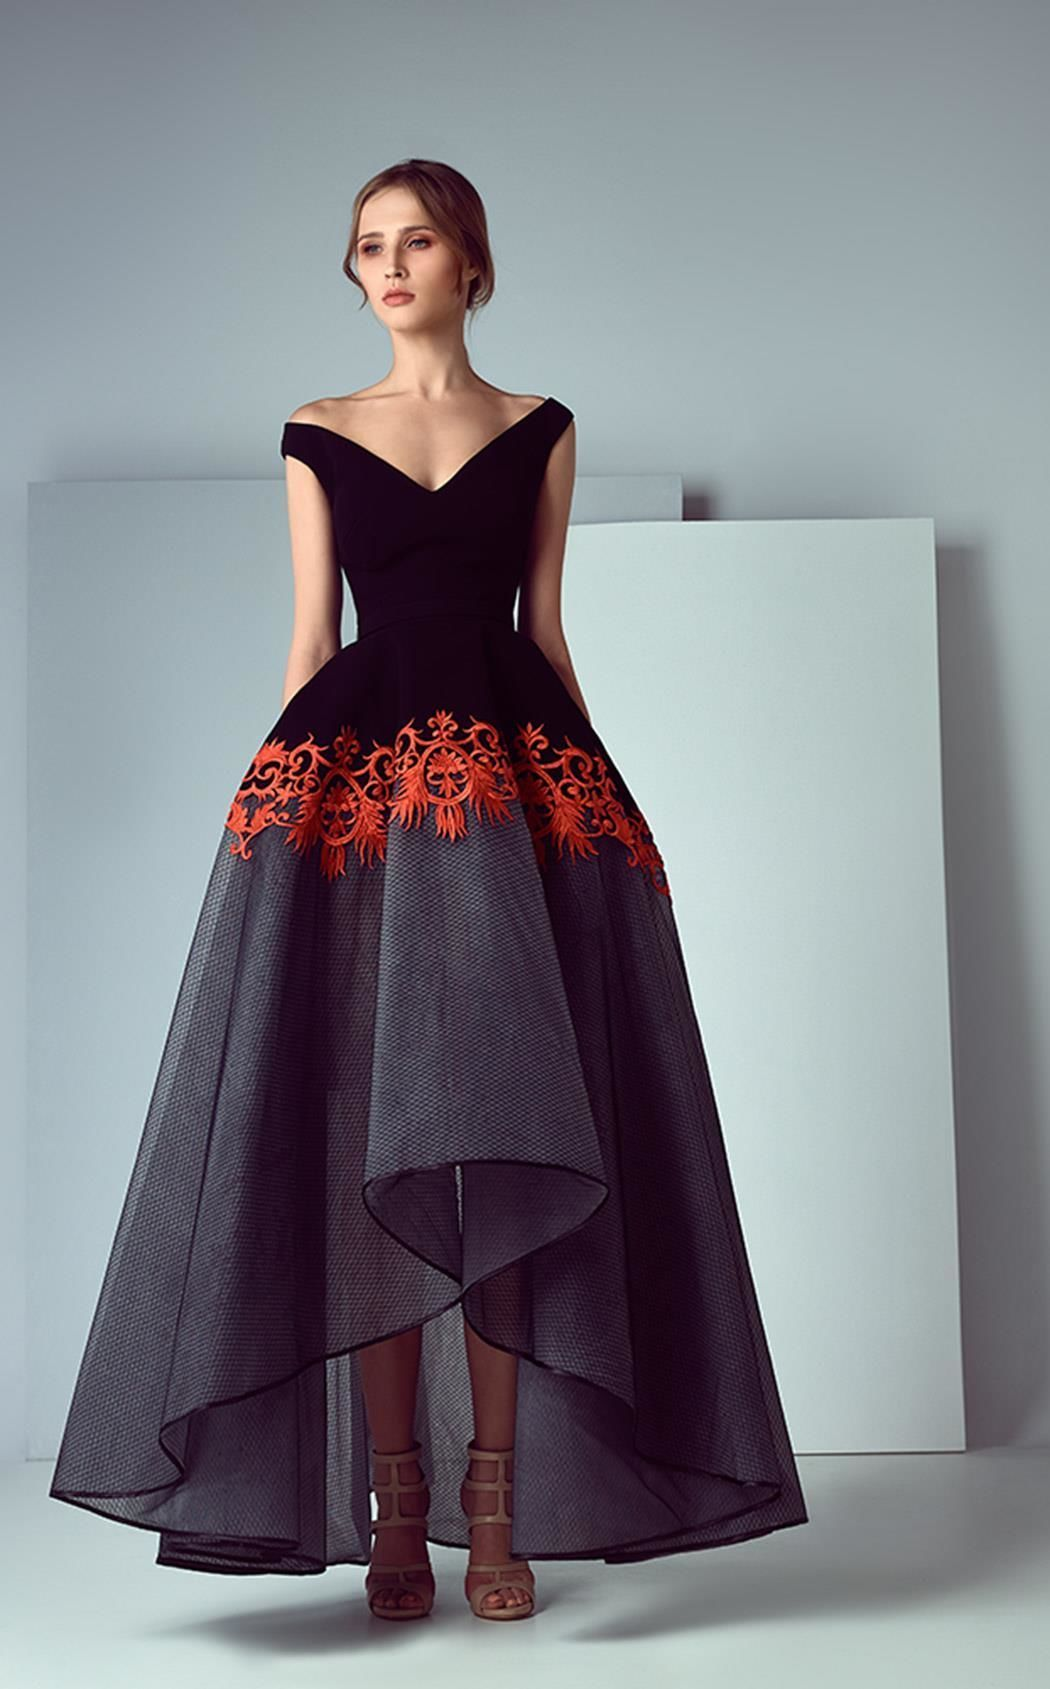 Amazing dresses by Saiid Kobeisy | Noel | Pinterest | Amazing ...